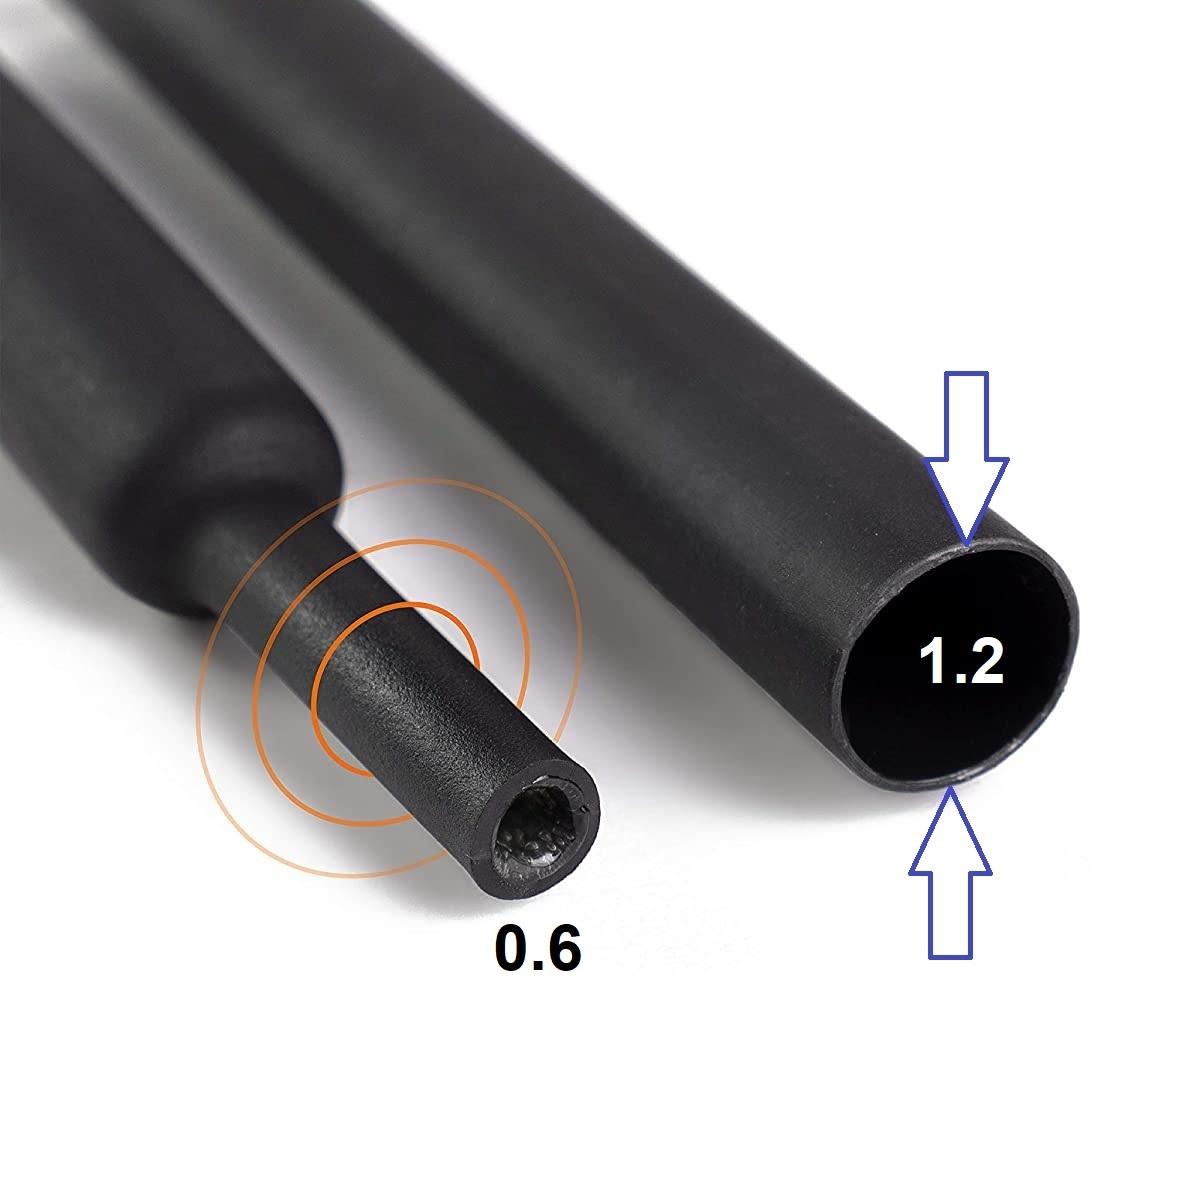 1.2mm Diameter